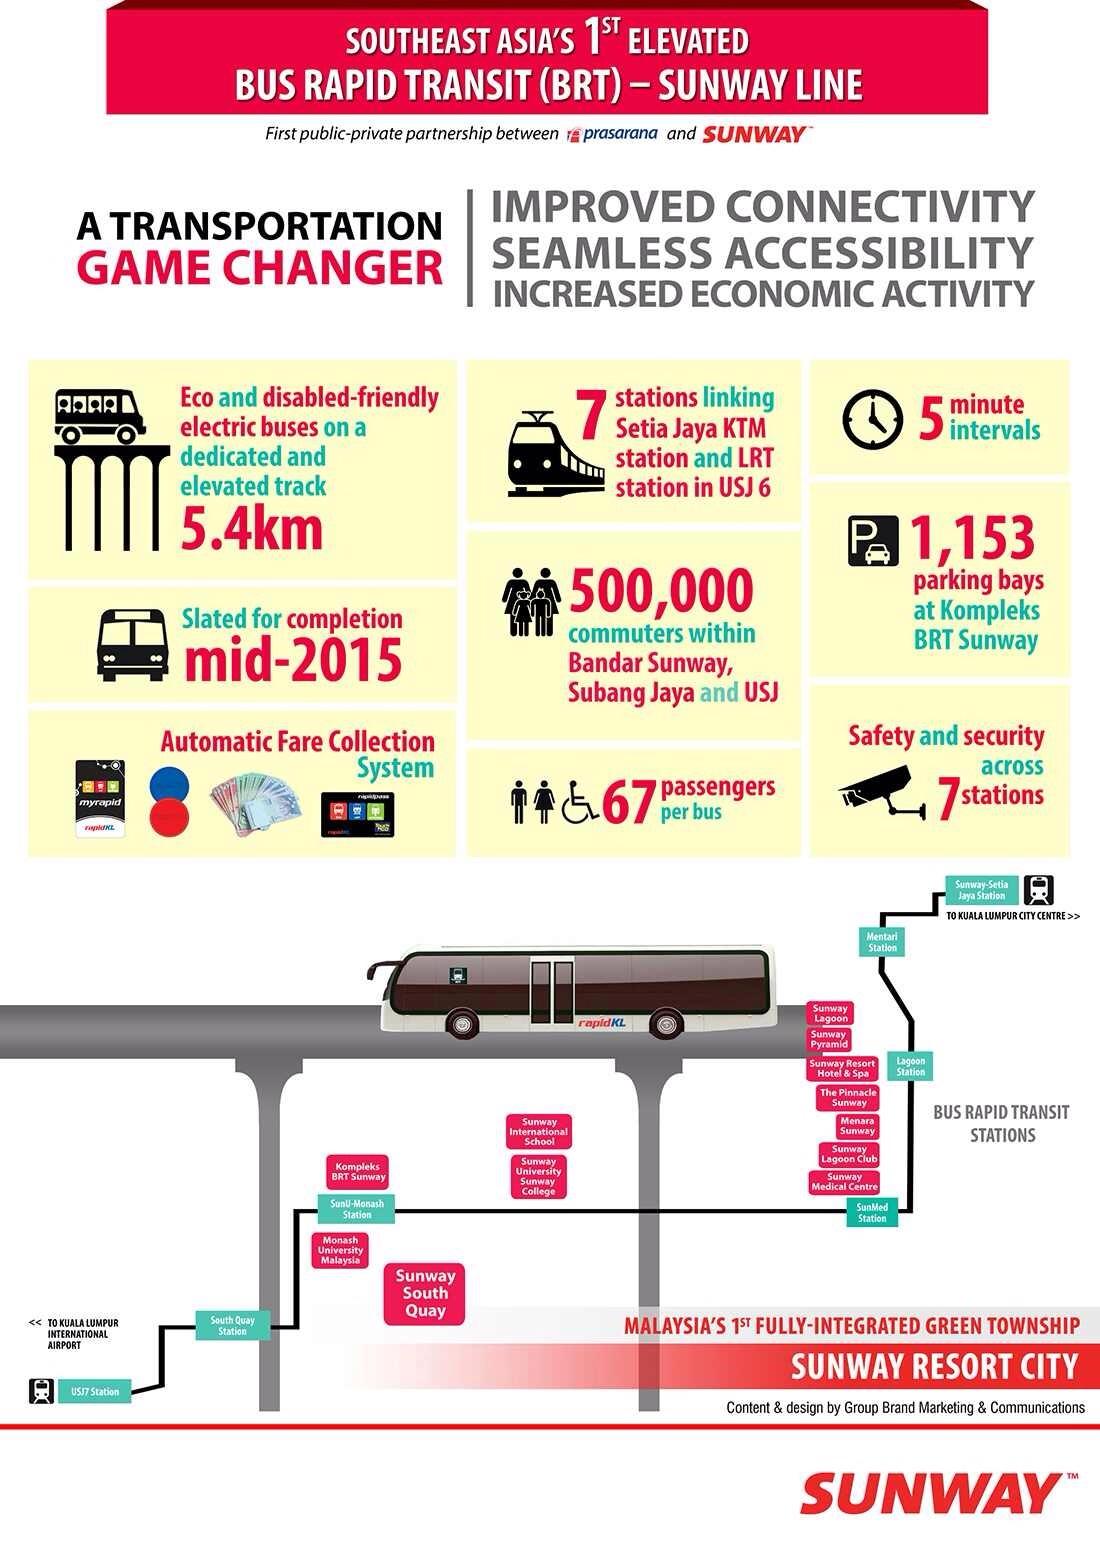 Bus Rapid Transit (BRT) - Sunway Line property investment lagoon perdana apartment